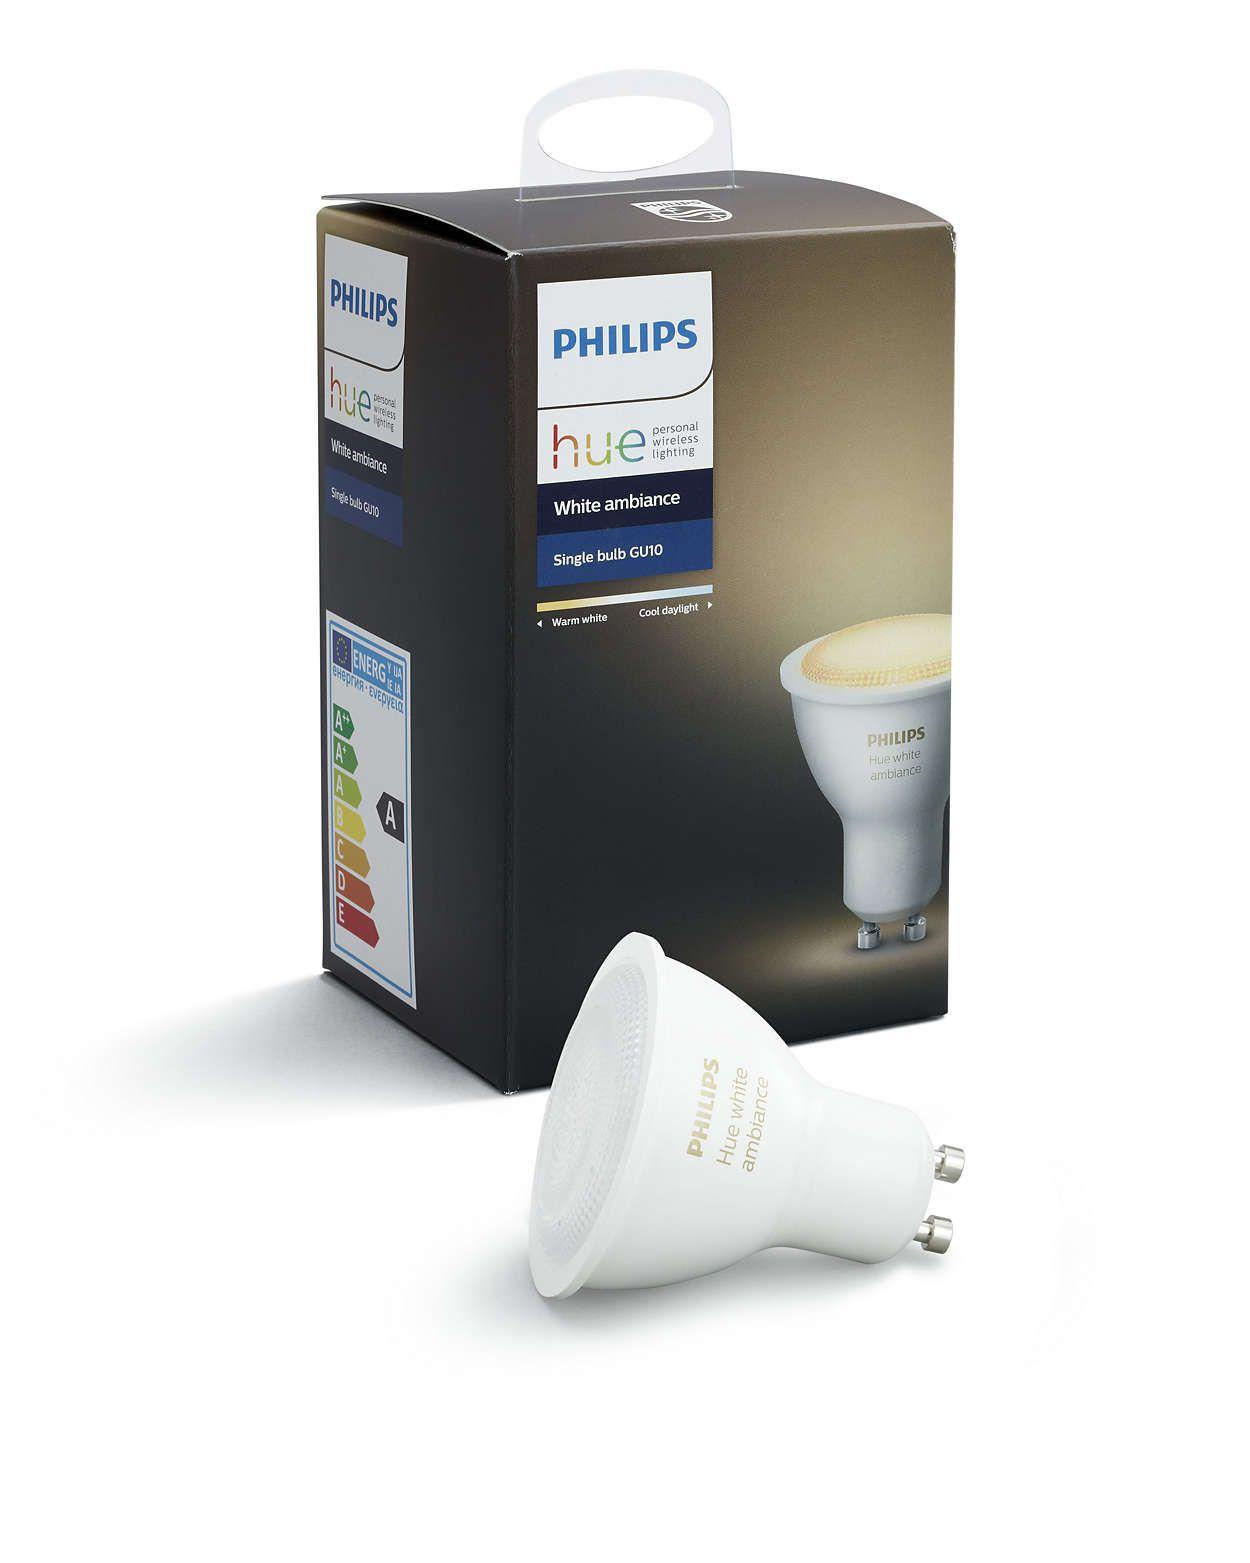 Philips Hue - GU10 - White Ambiance - Bluetooth